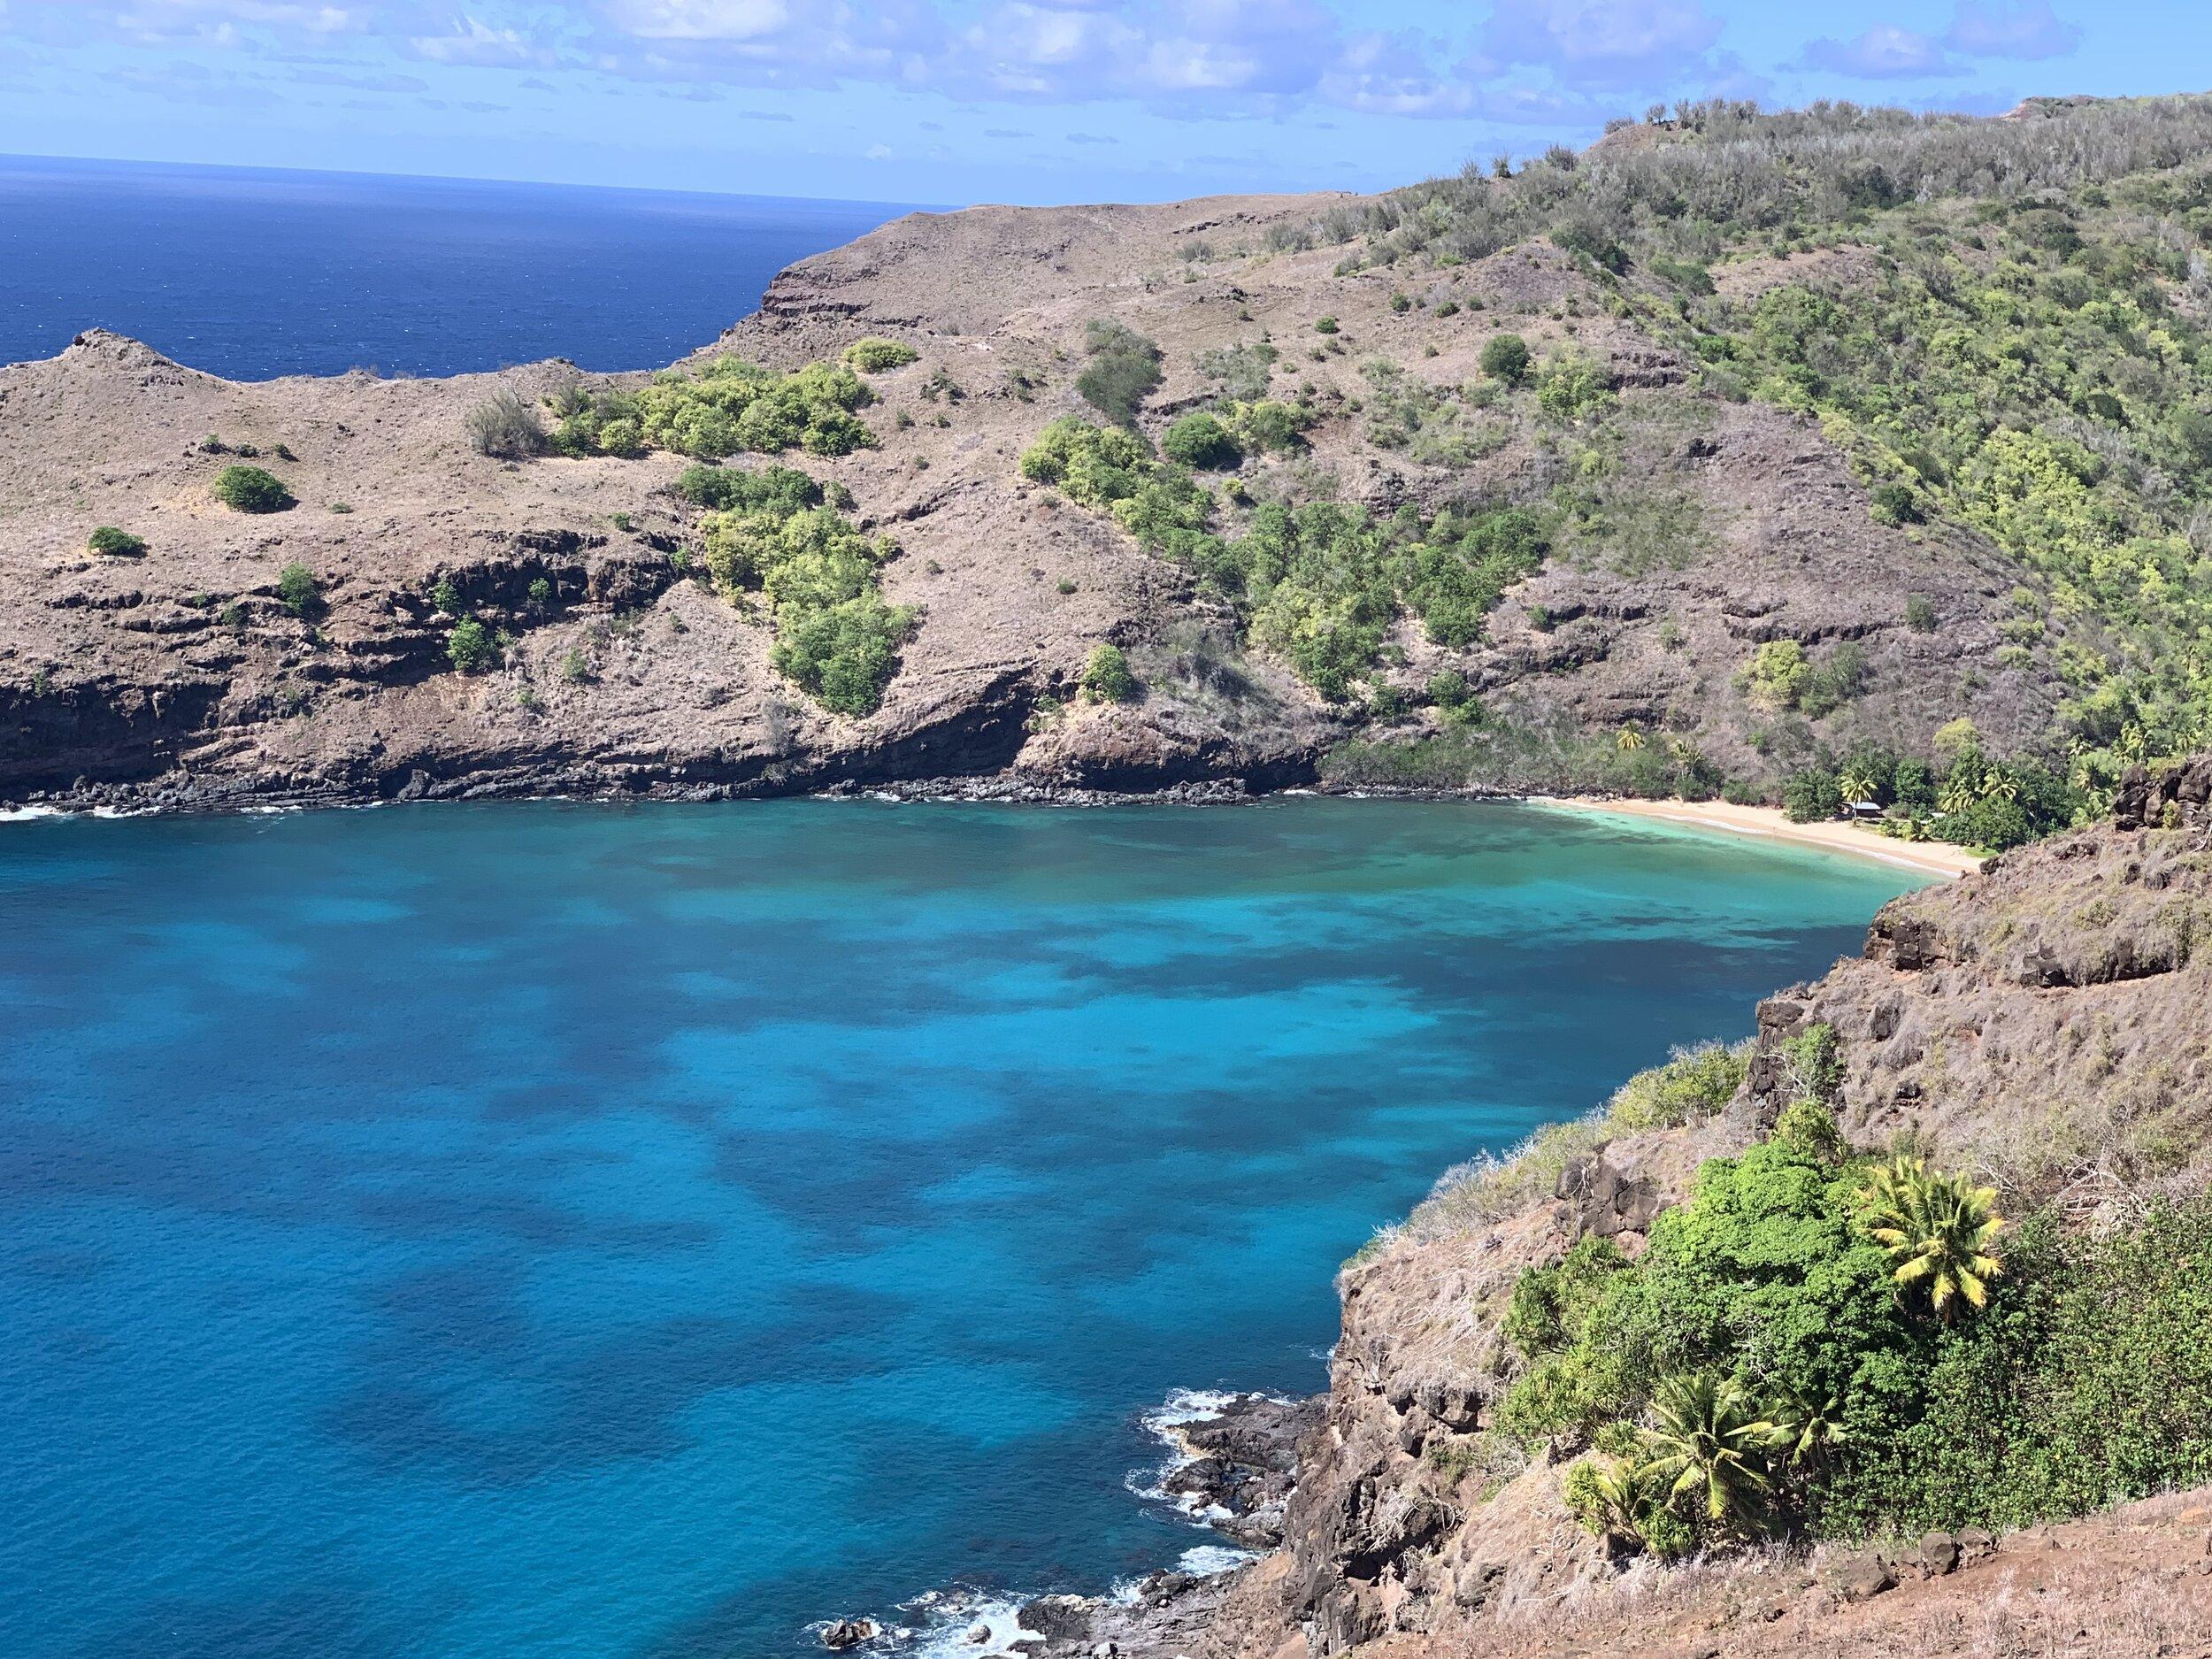 First view of Hanatekuua Bay, Hiva Oa.